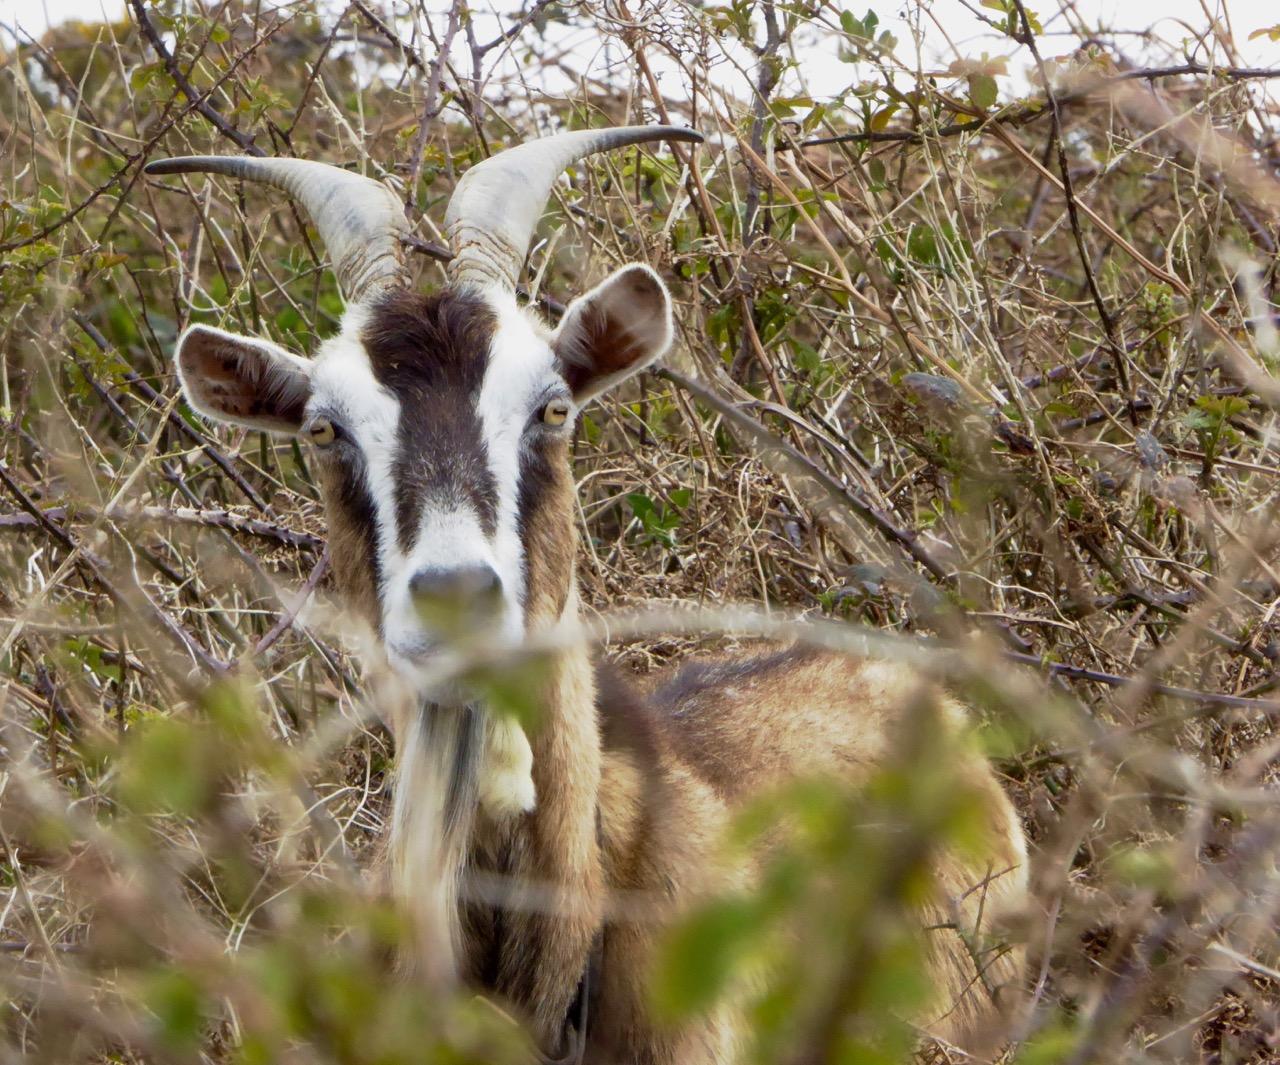 Nick's Goat